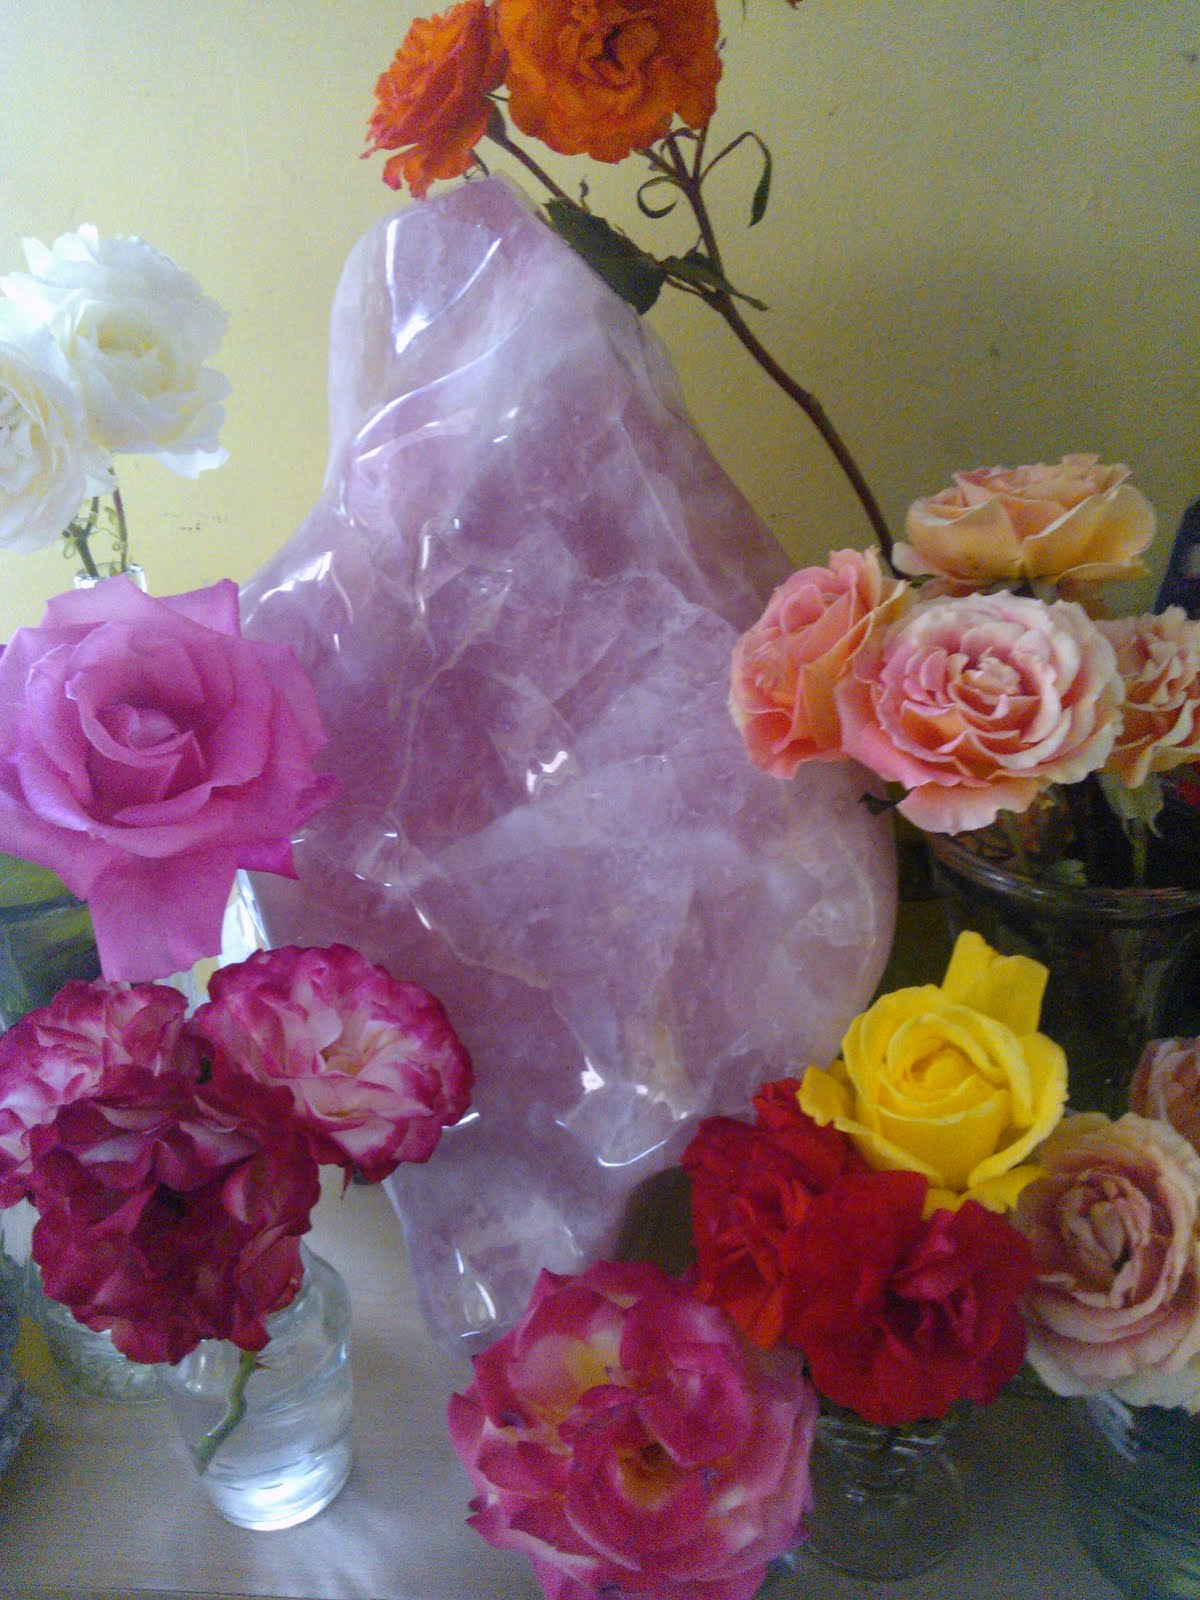 Cuarzo rosa para tu amor incondicional...